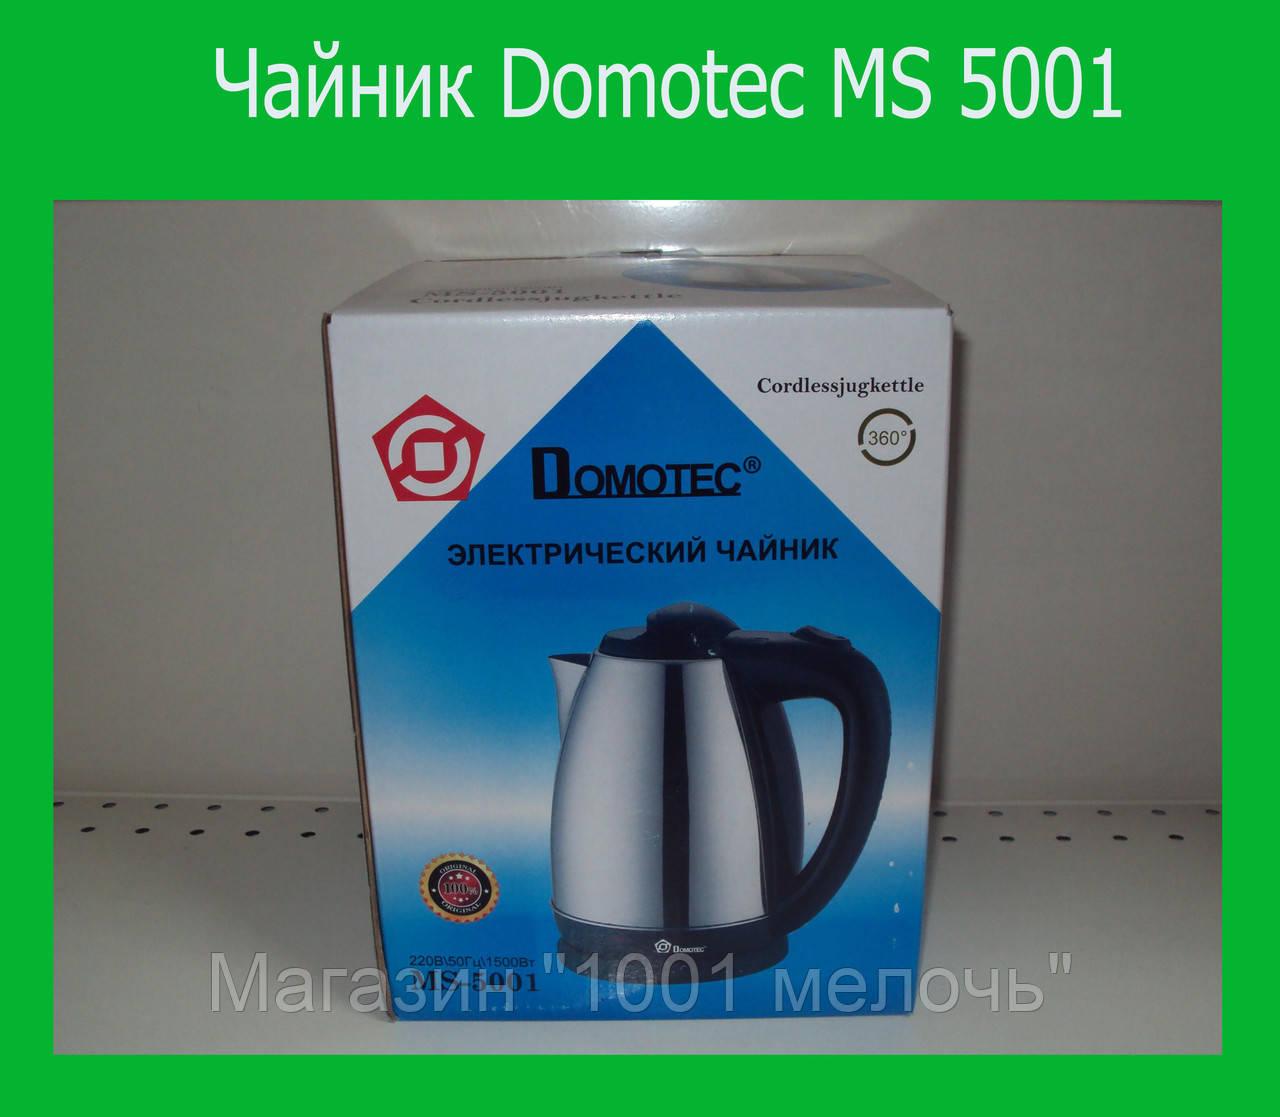 Чайник Dоmotec MS 5001